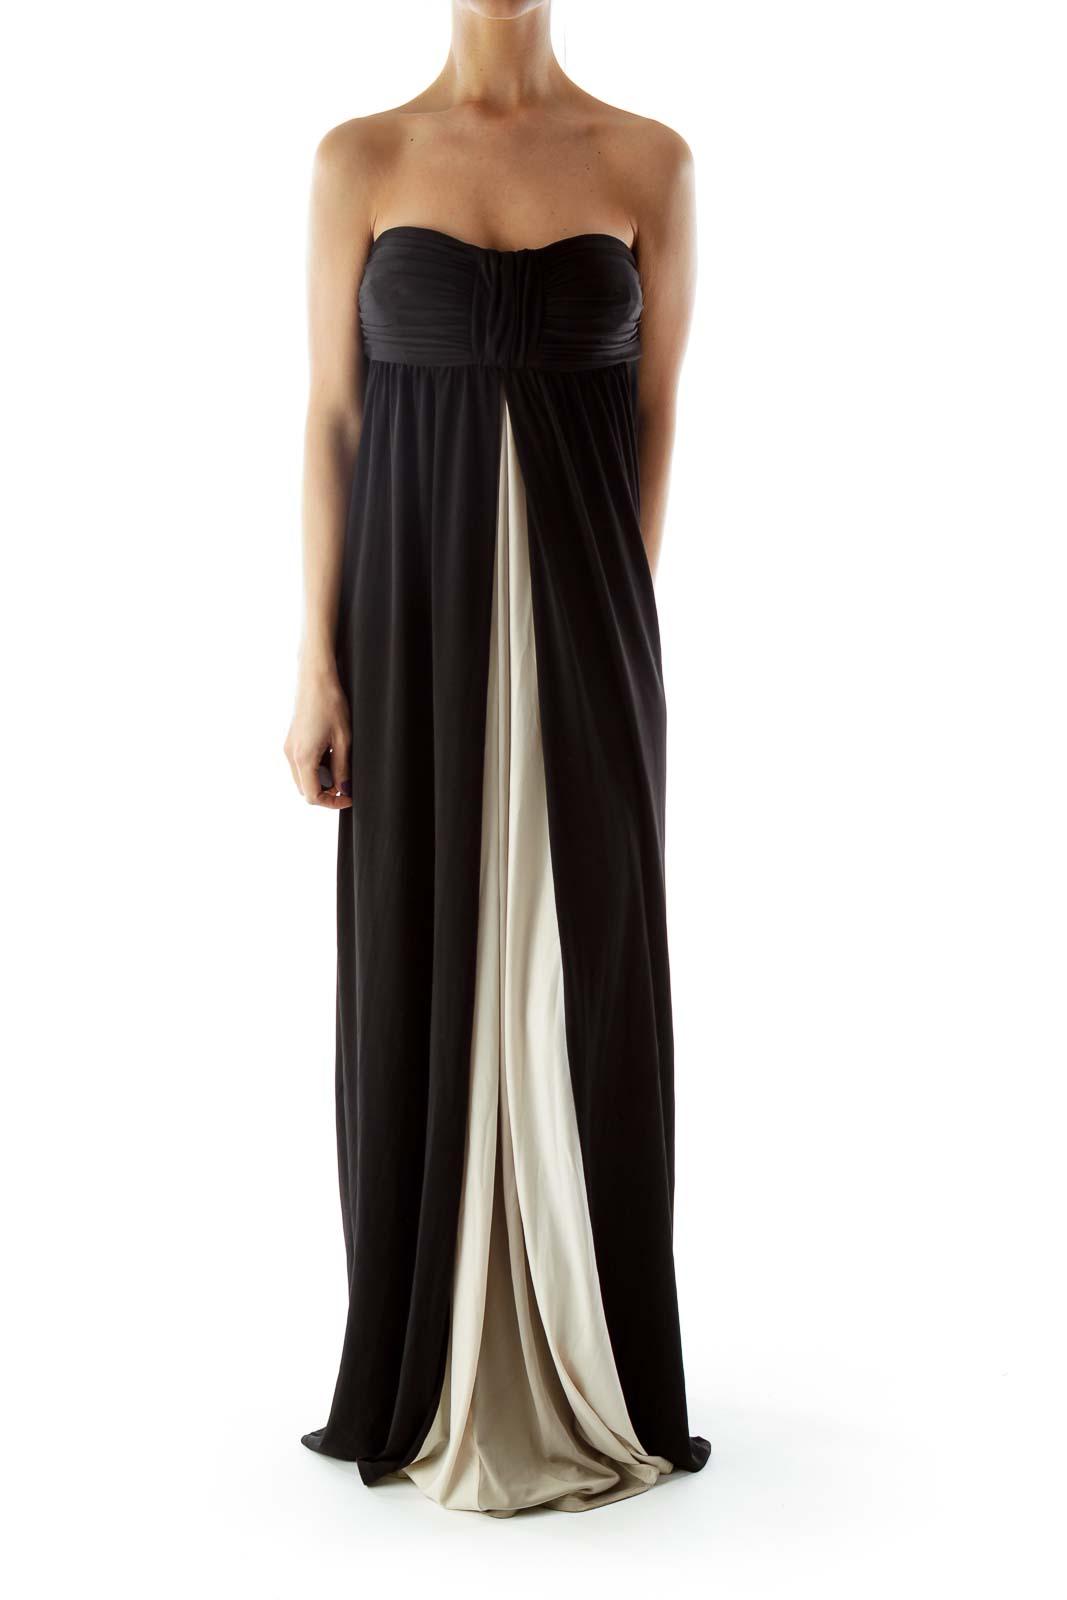 Black Strapless Color Block Evening Dress